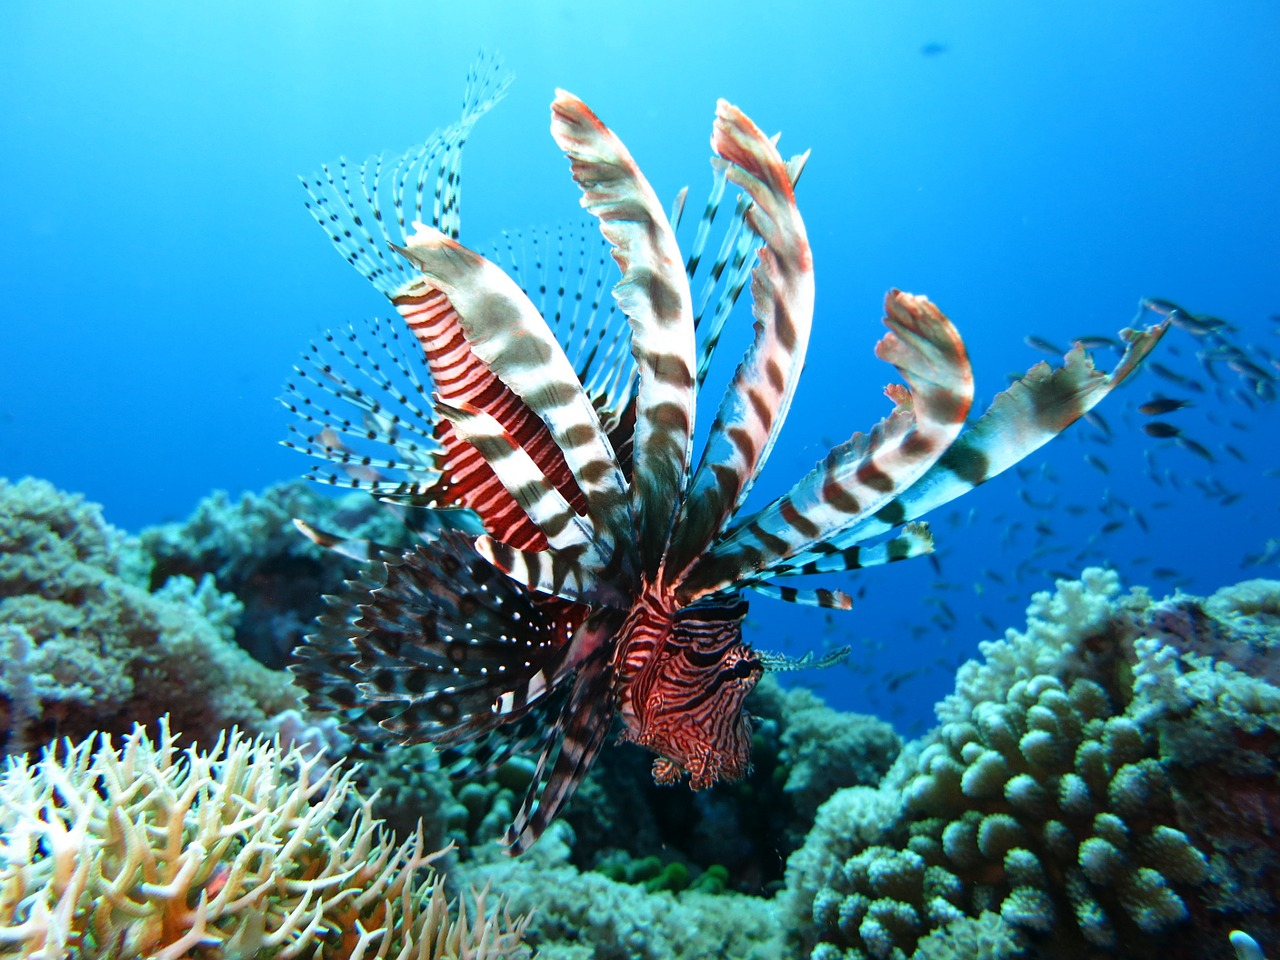 lionfish, scuba diving, underwater-1430225.jpg